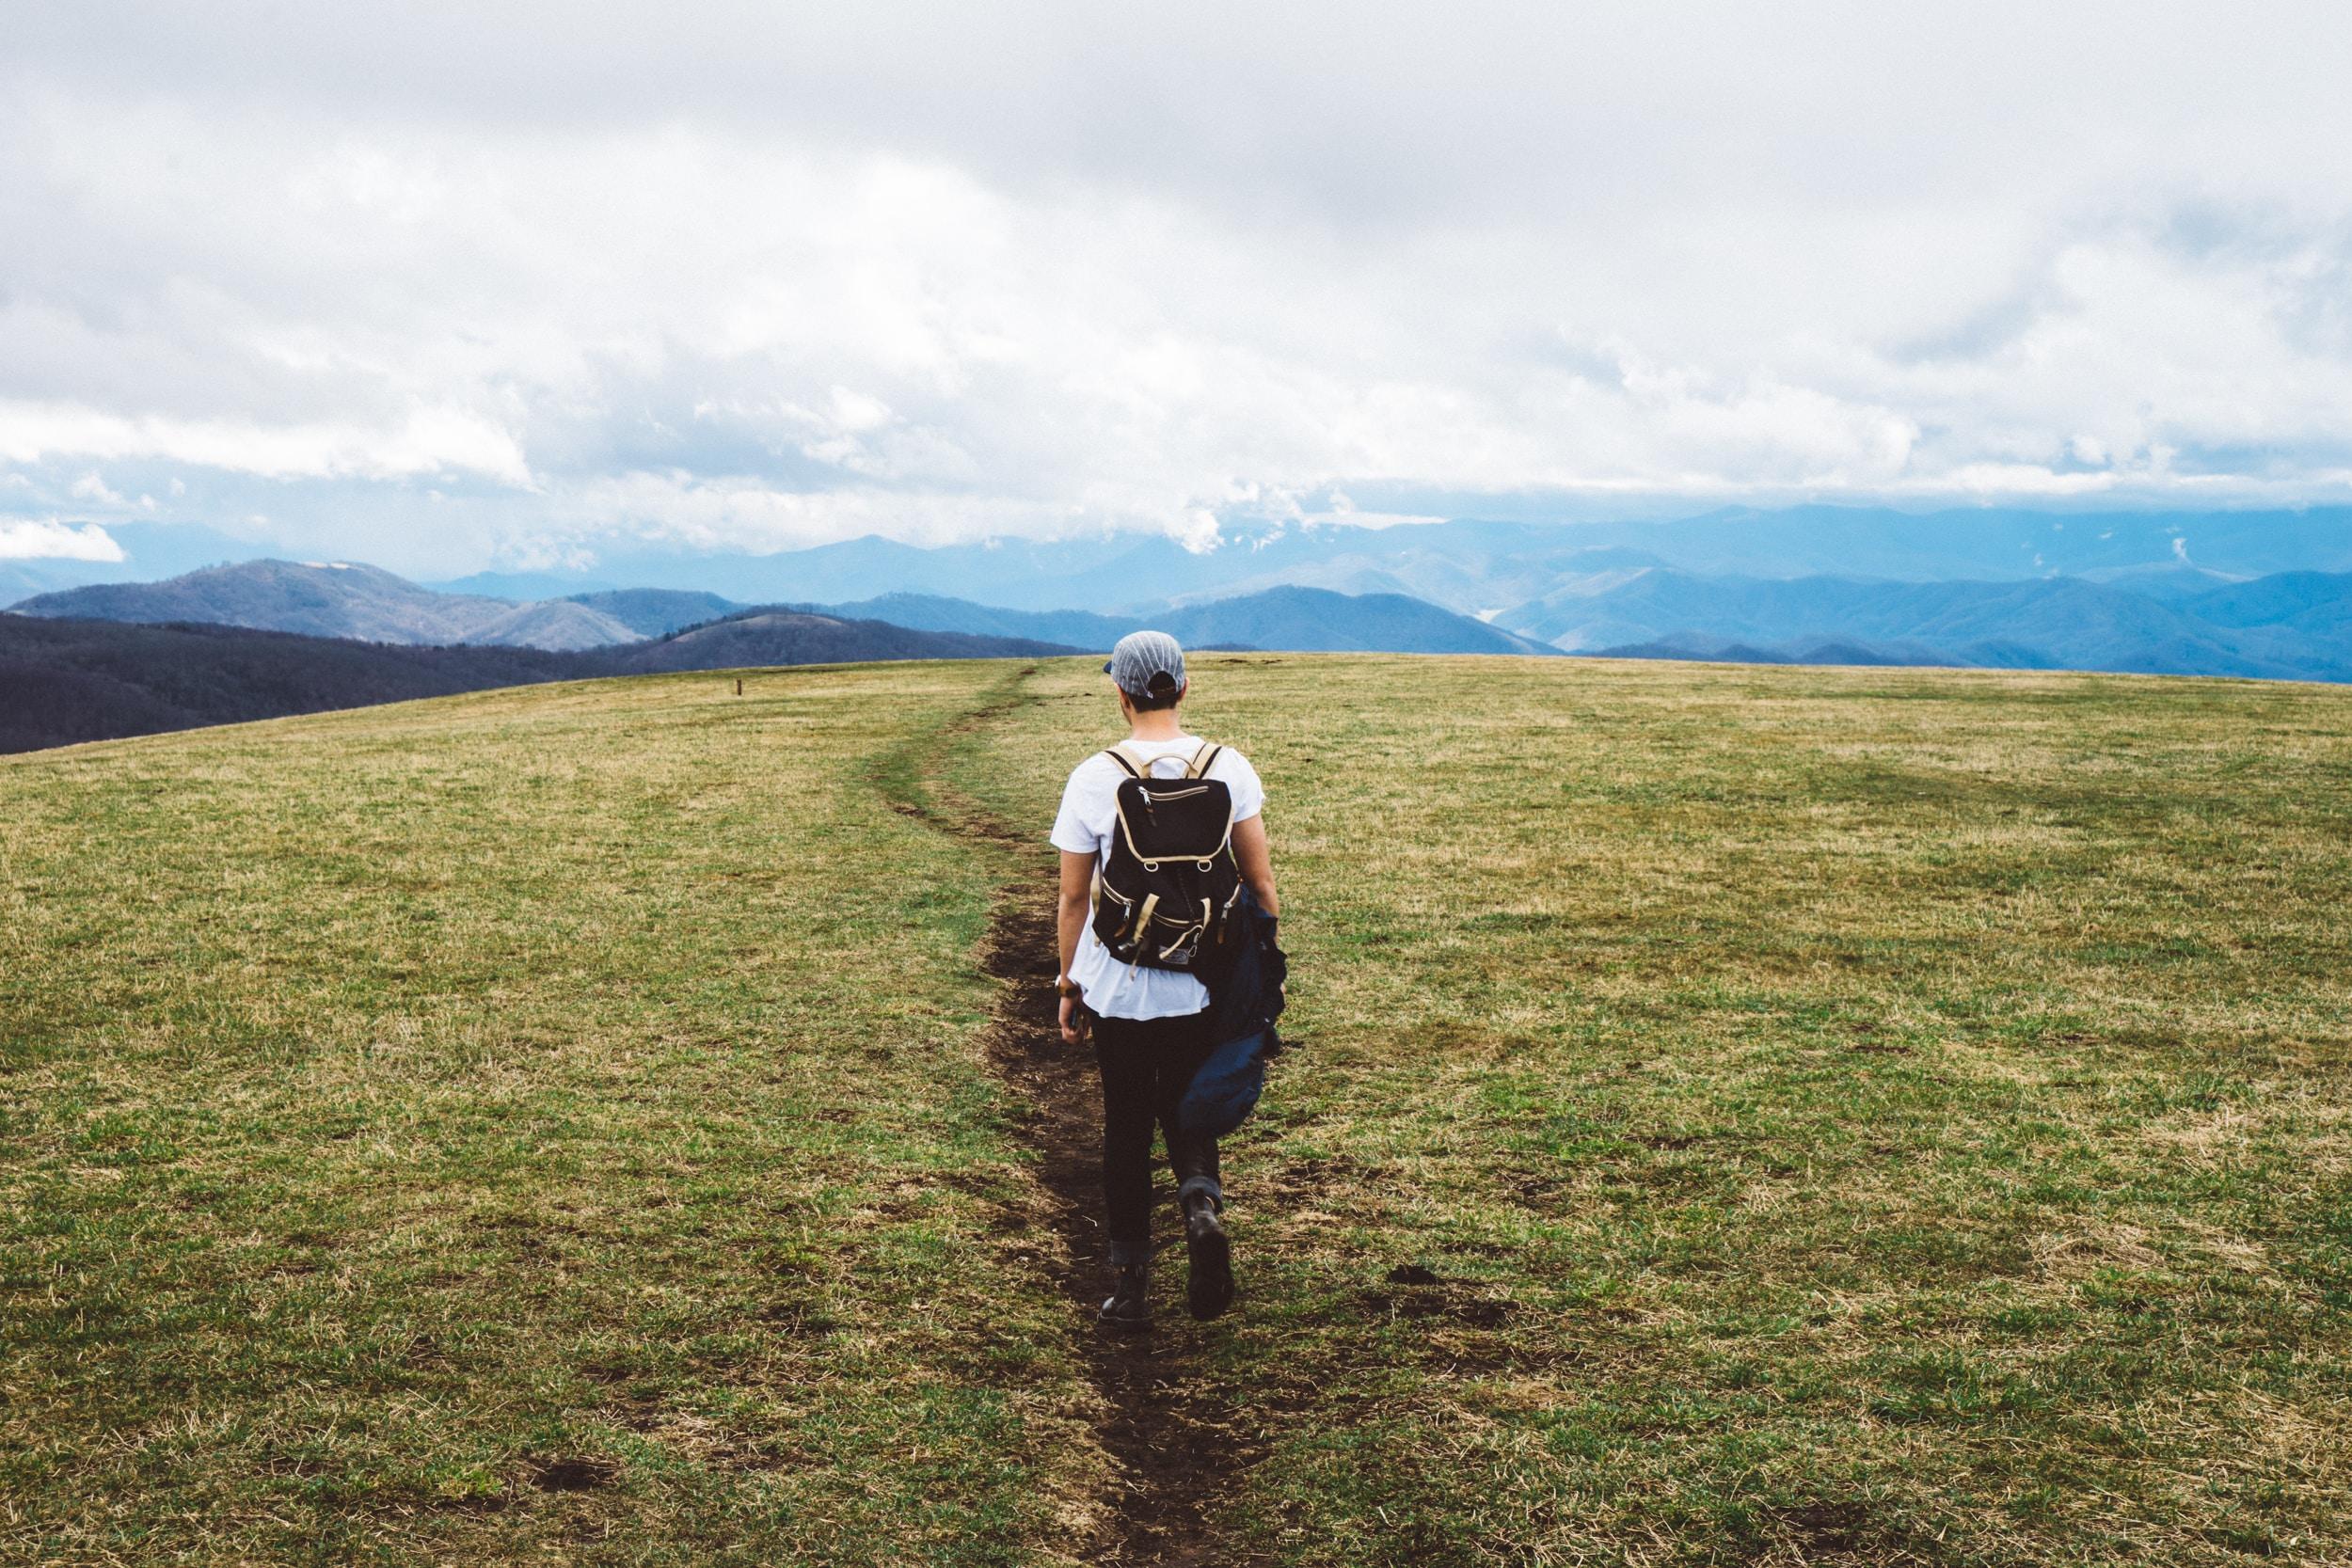 person wearing black backpack walking on green grass field